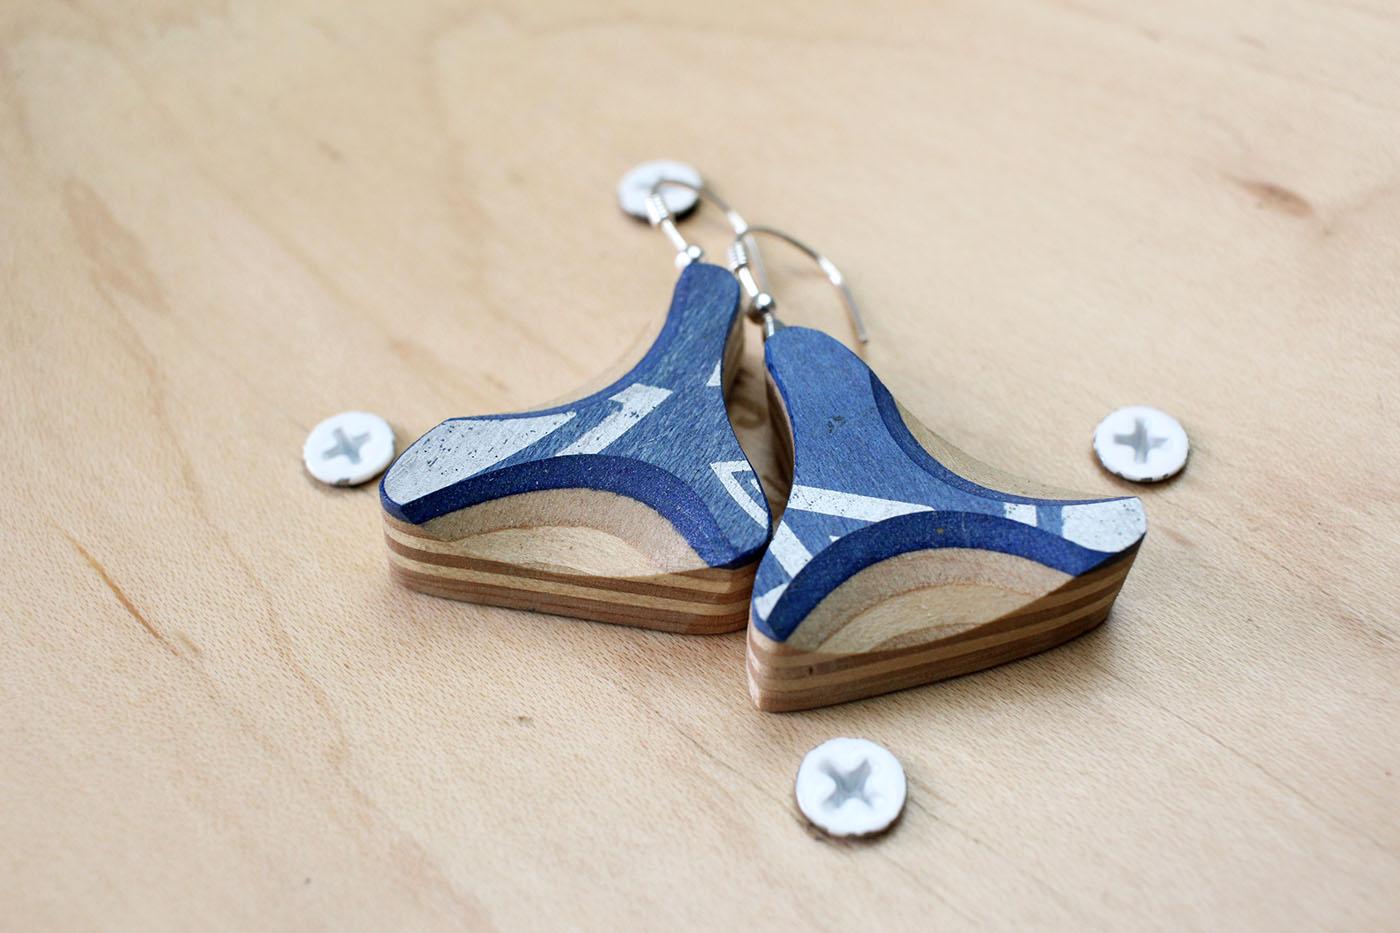 earrings special edition skatan llc9